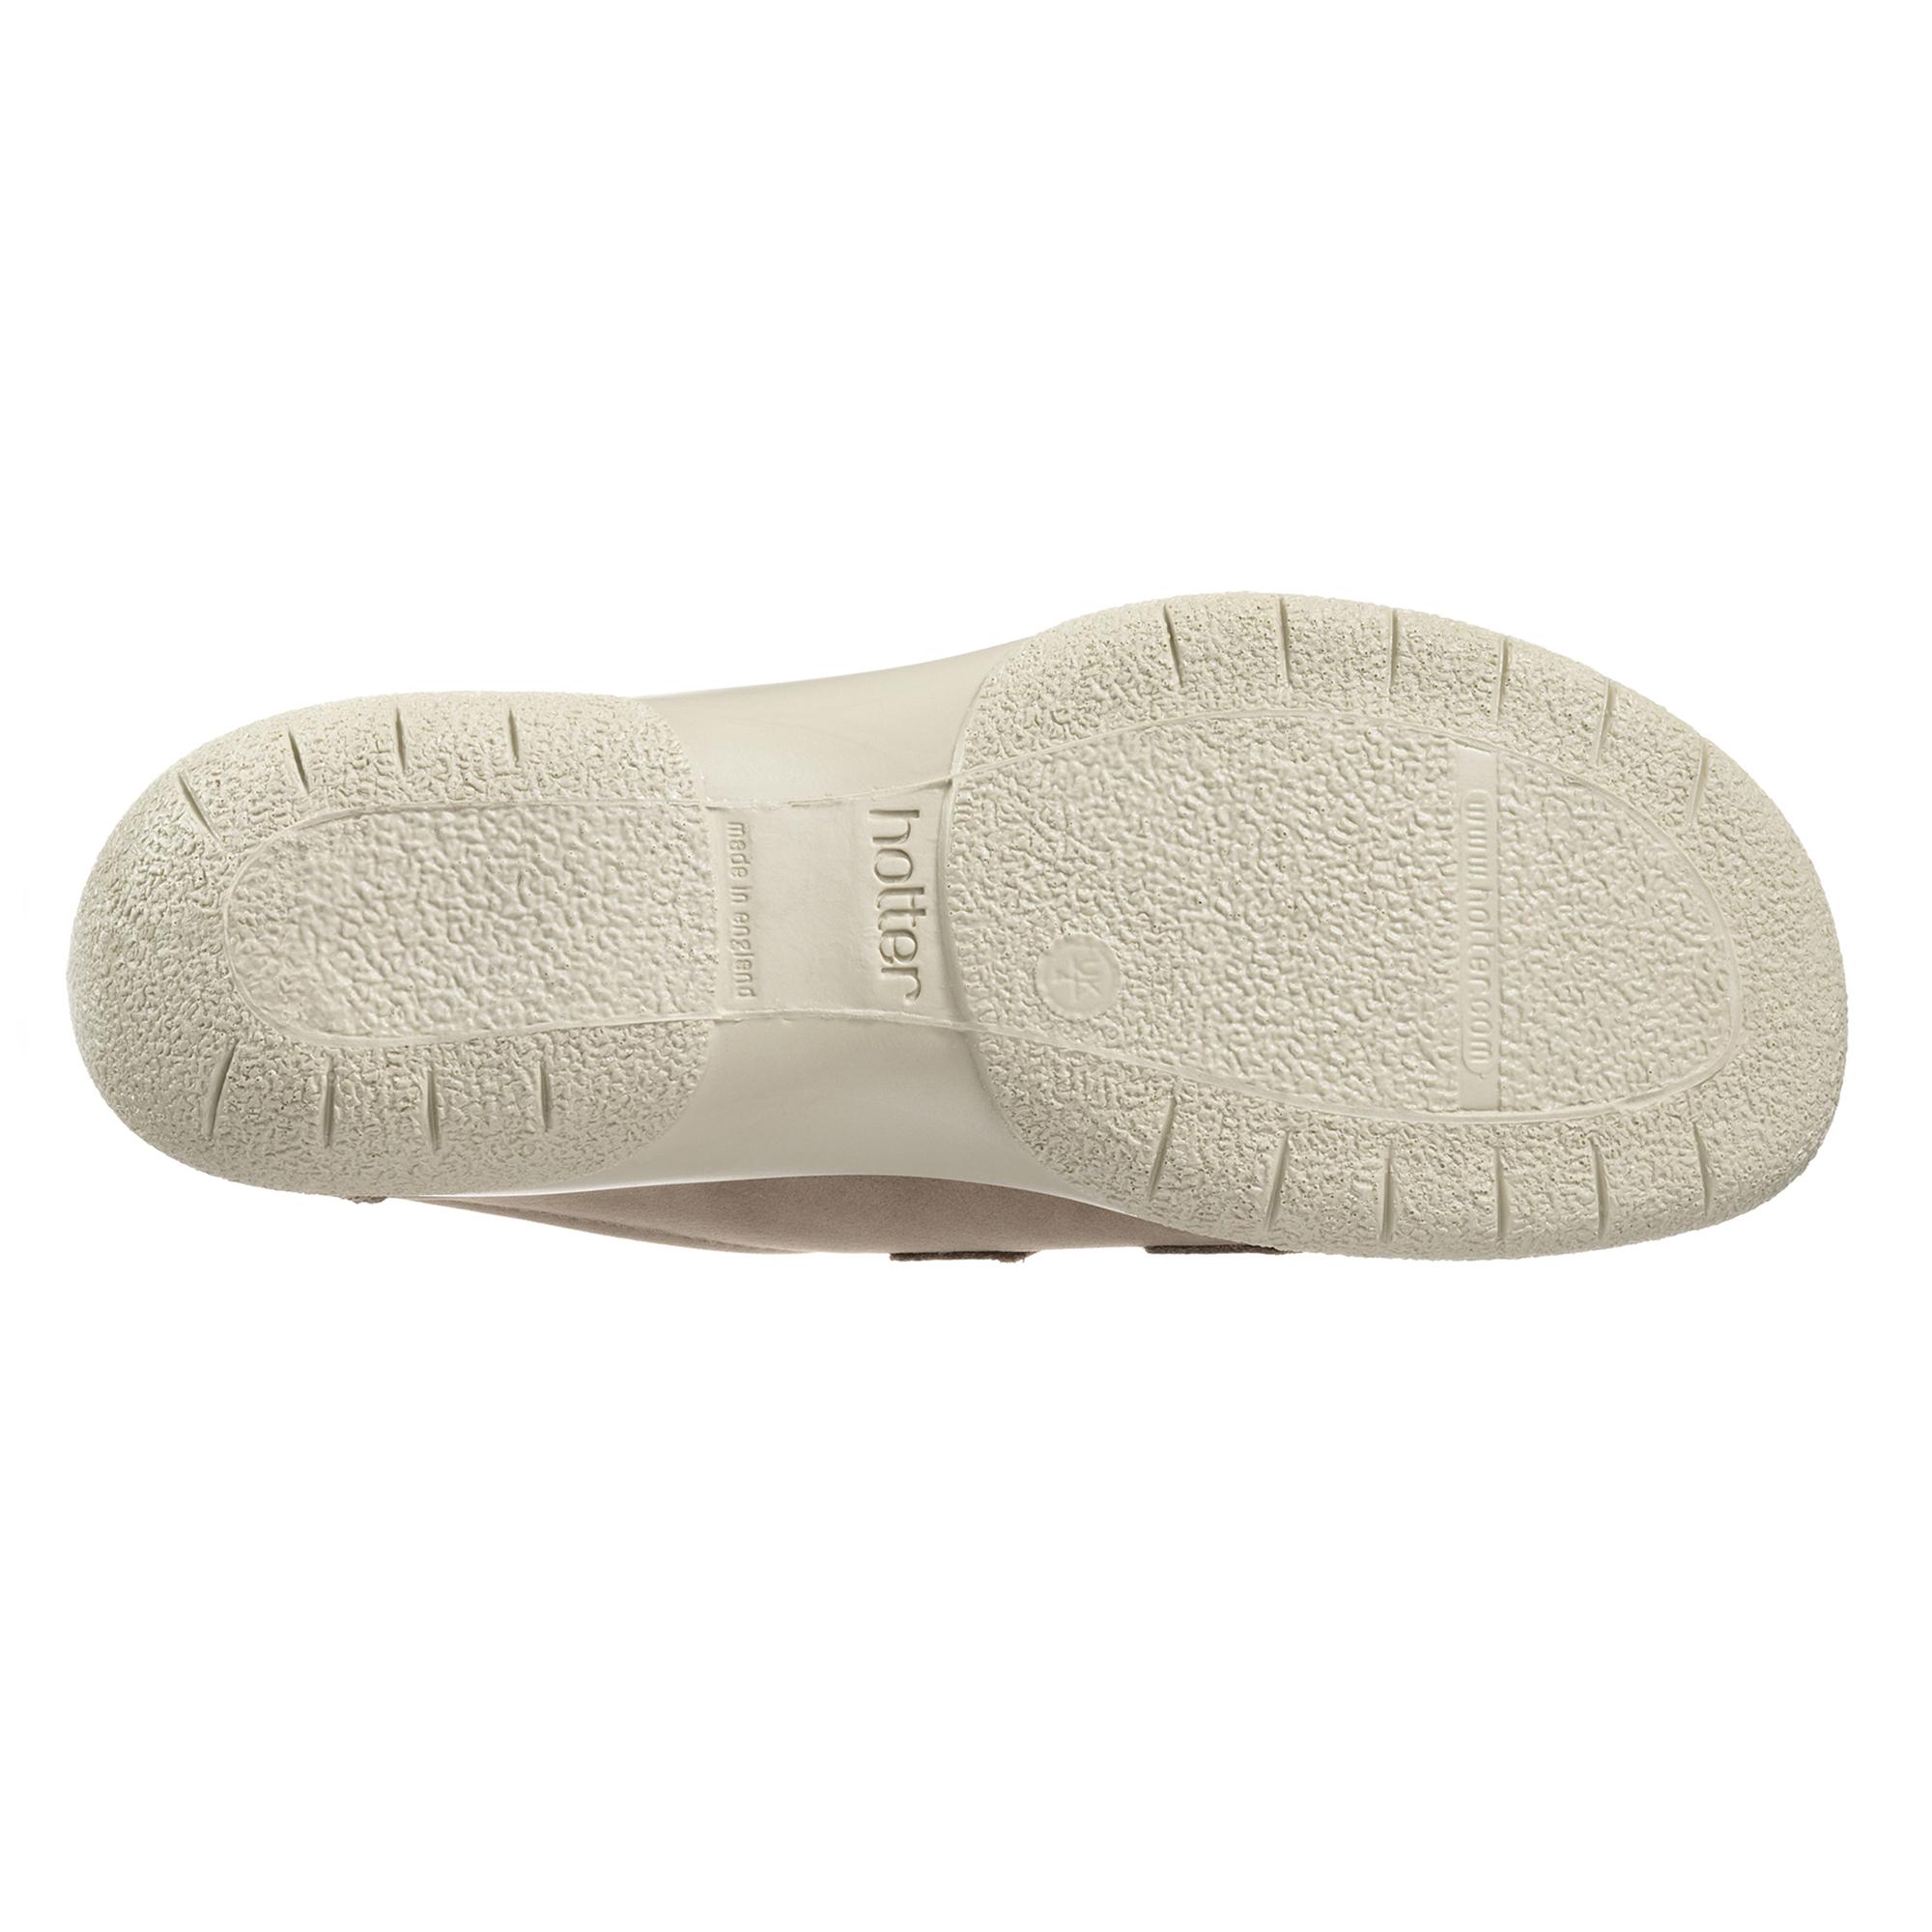 Hotter-Mujer-Leap-Senoras-Casual-Zapatos-Calzado-Zapatillas-Cuero-Textil